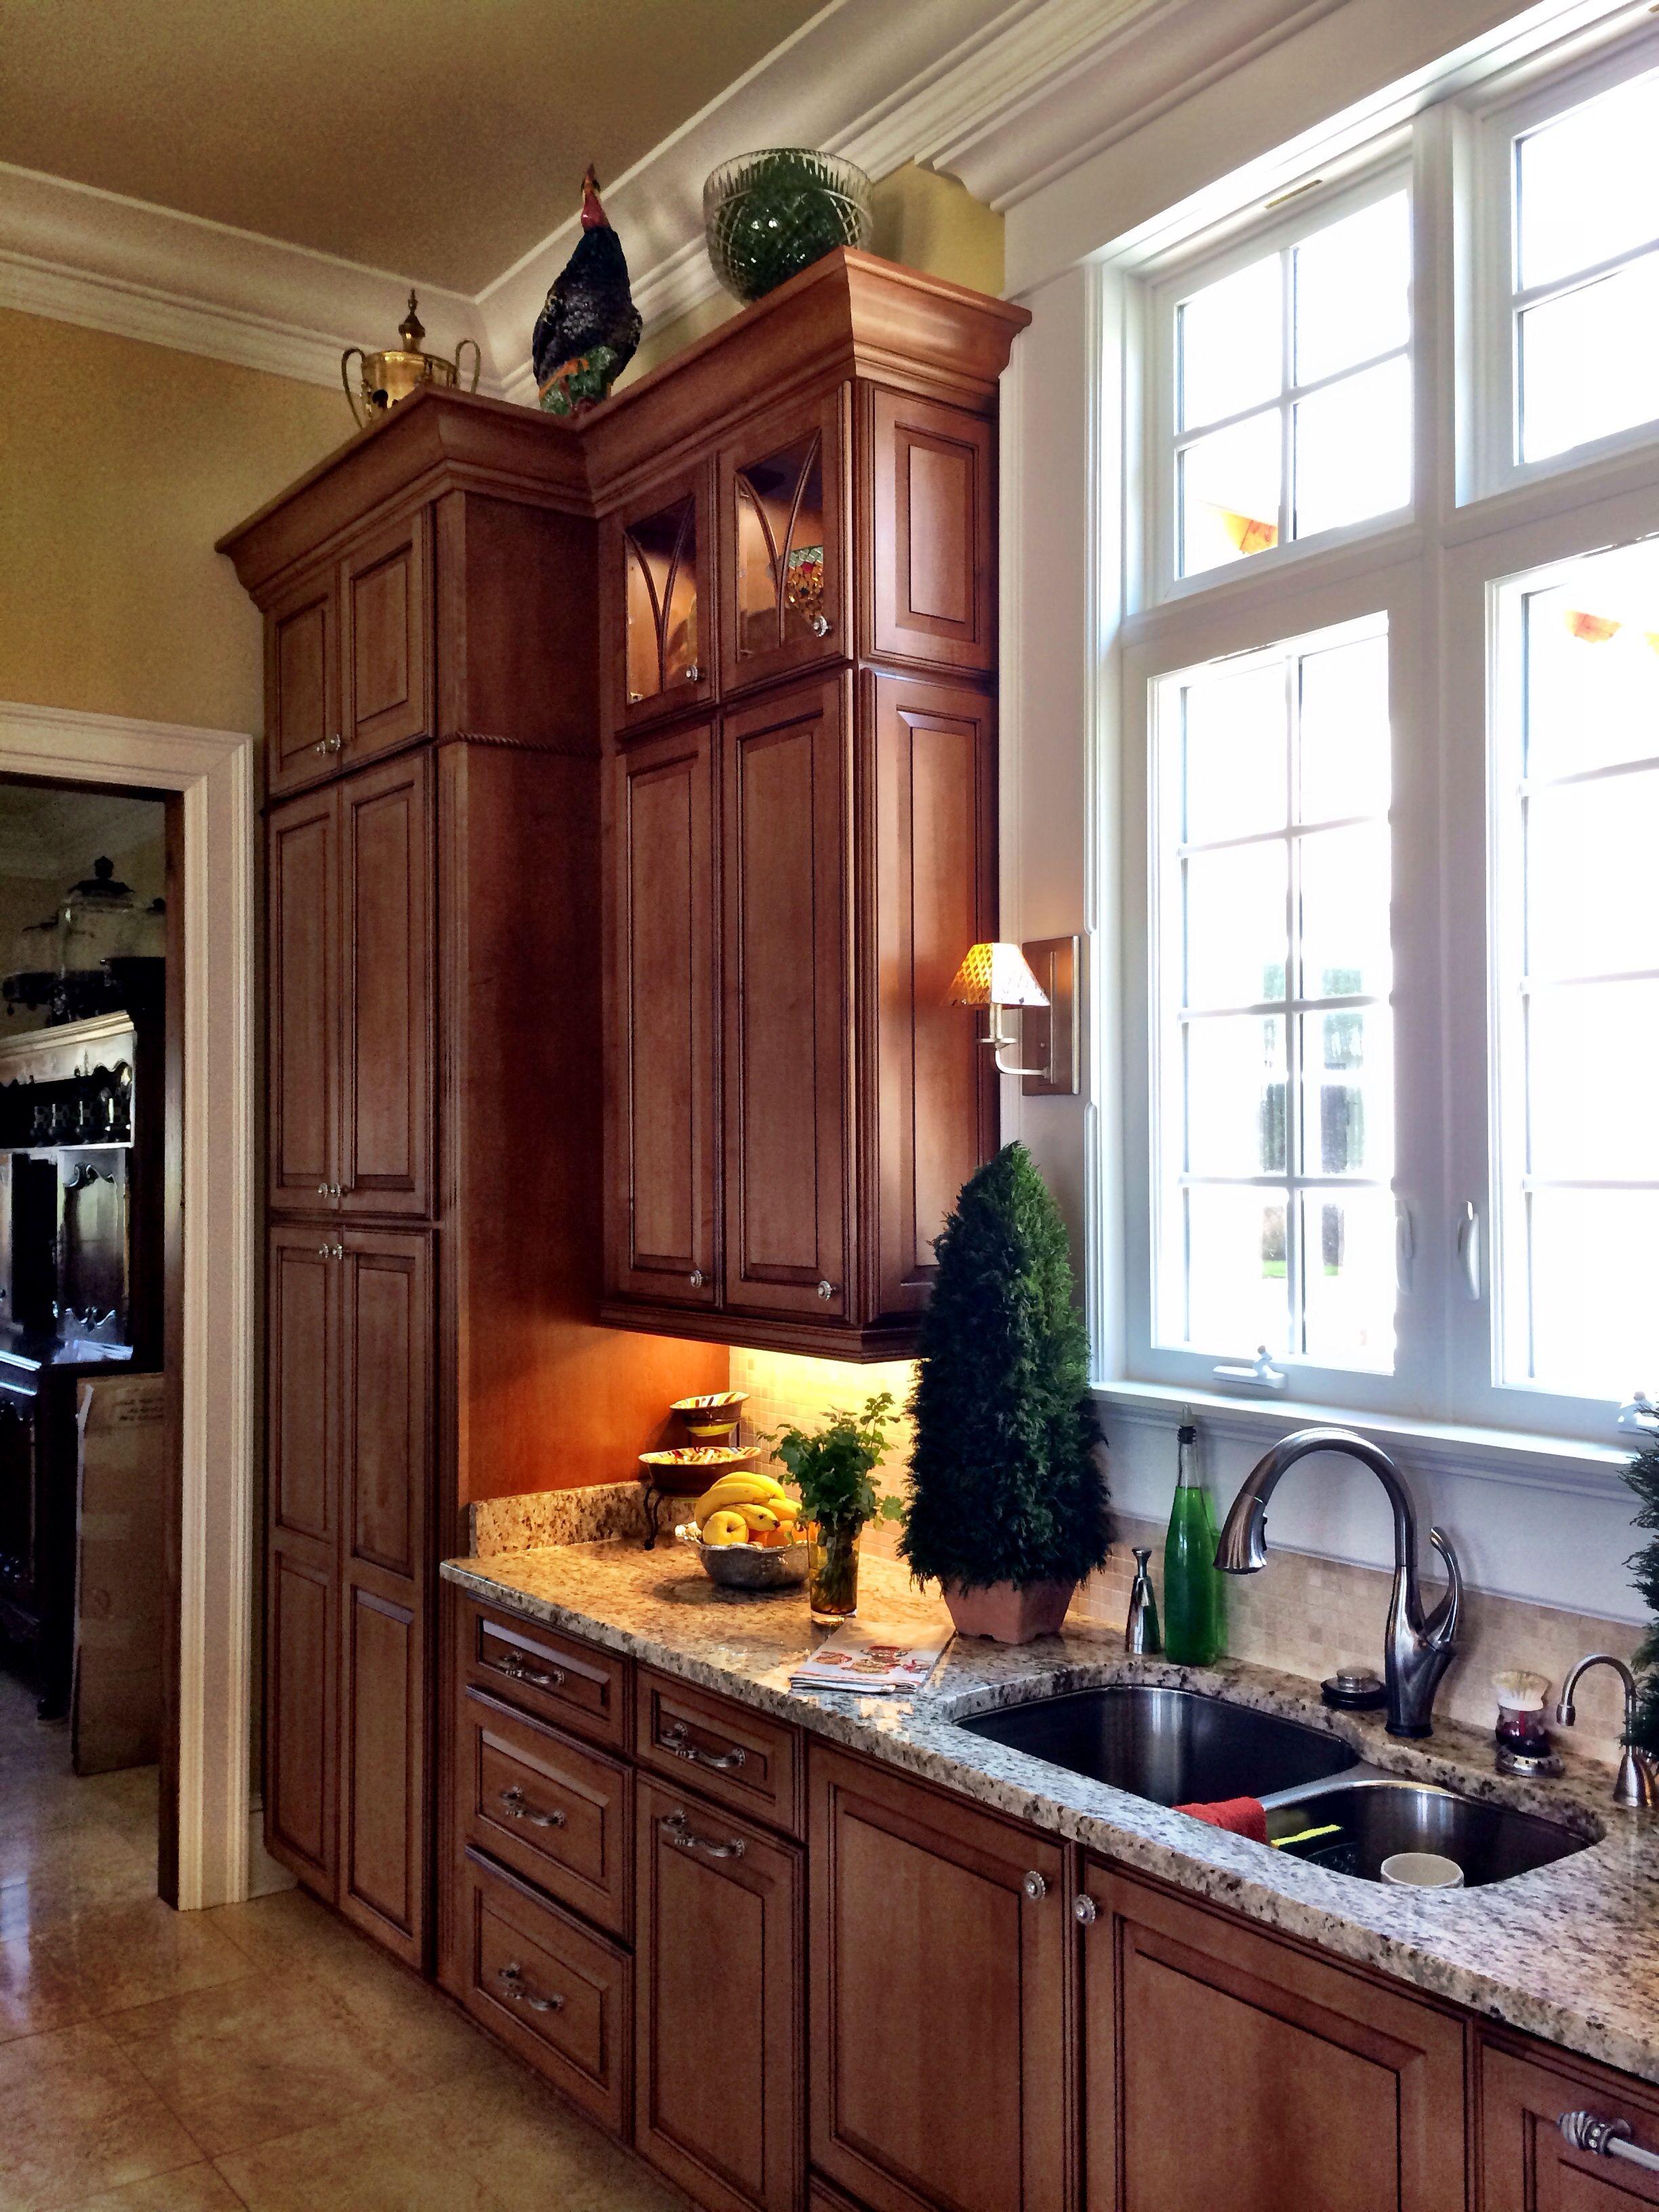 Kitchen And Bath Design Herrin Il